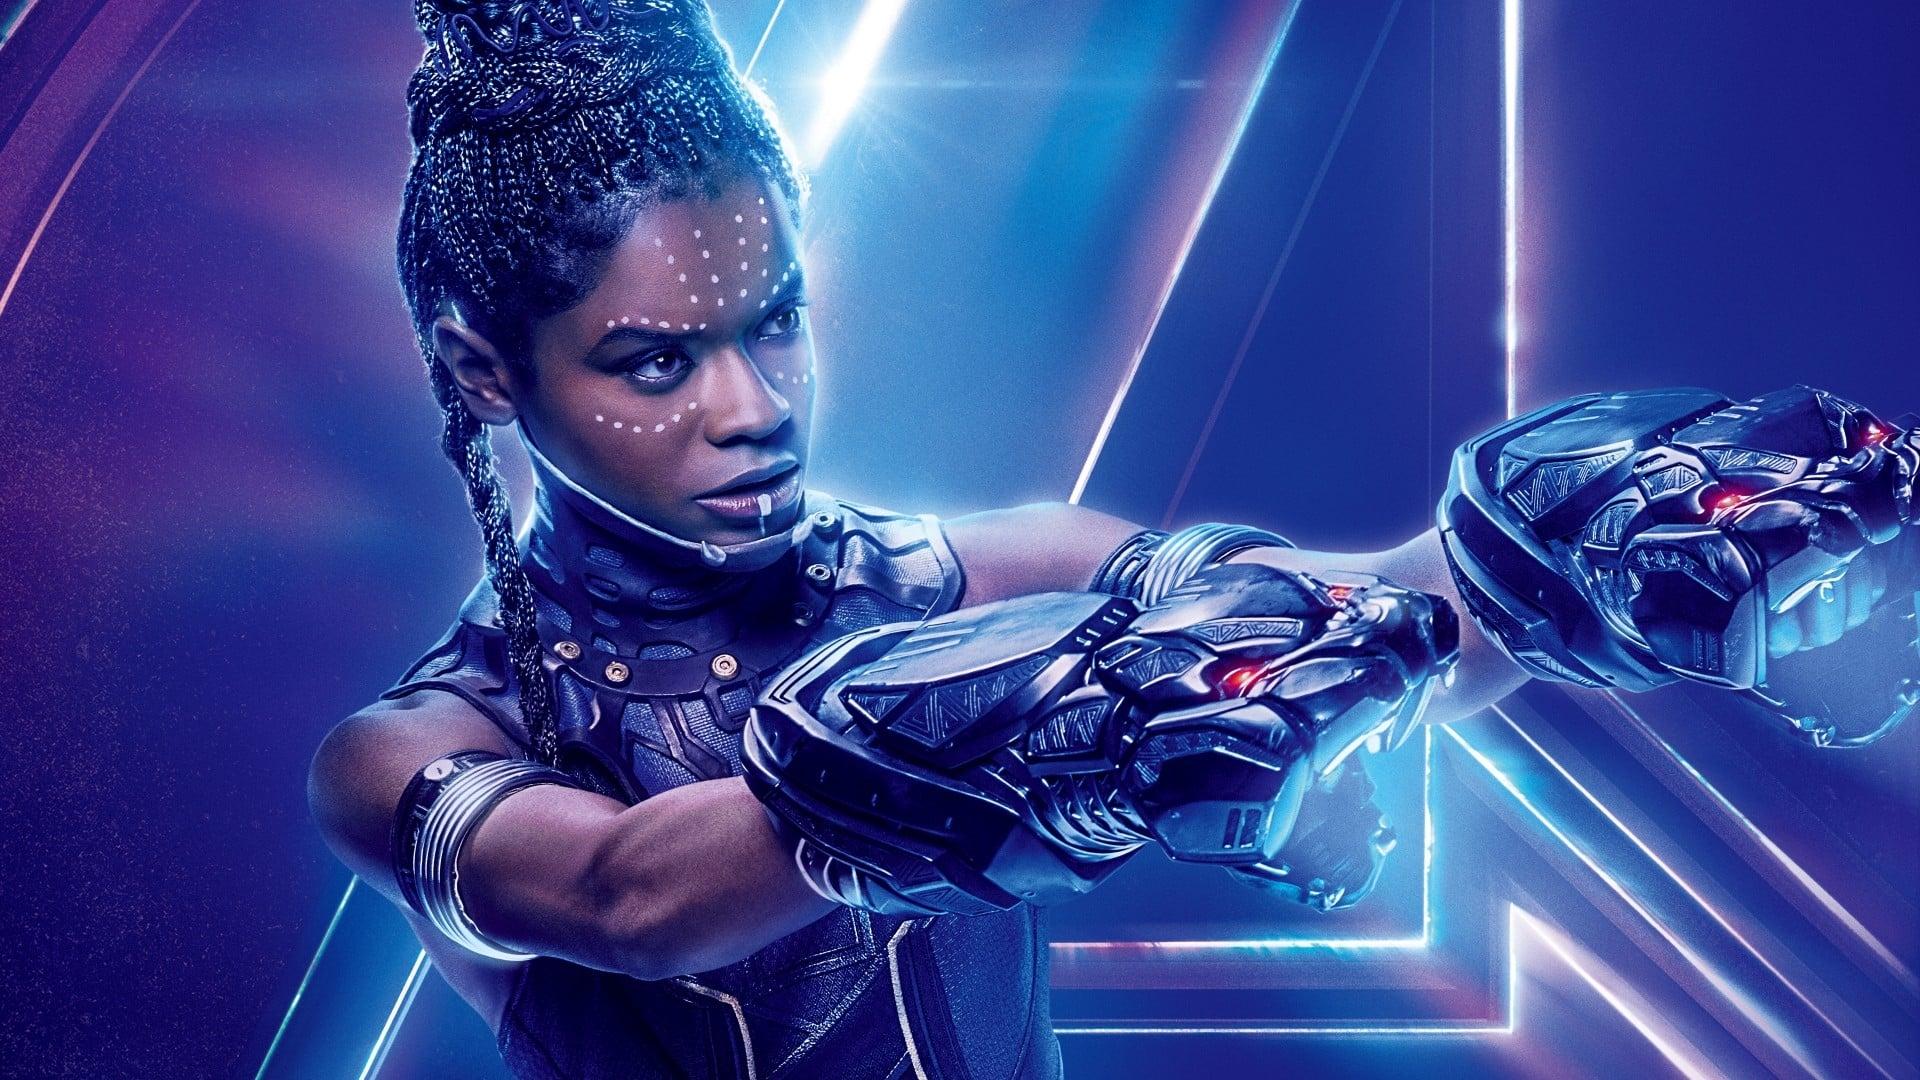 Watch Full Avengers: Infinity War 2018 Movie